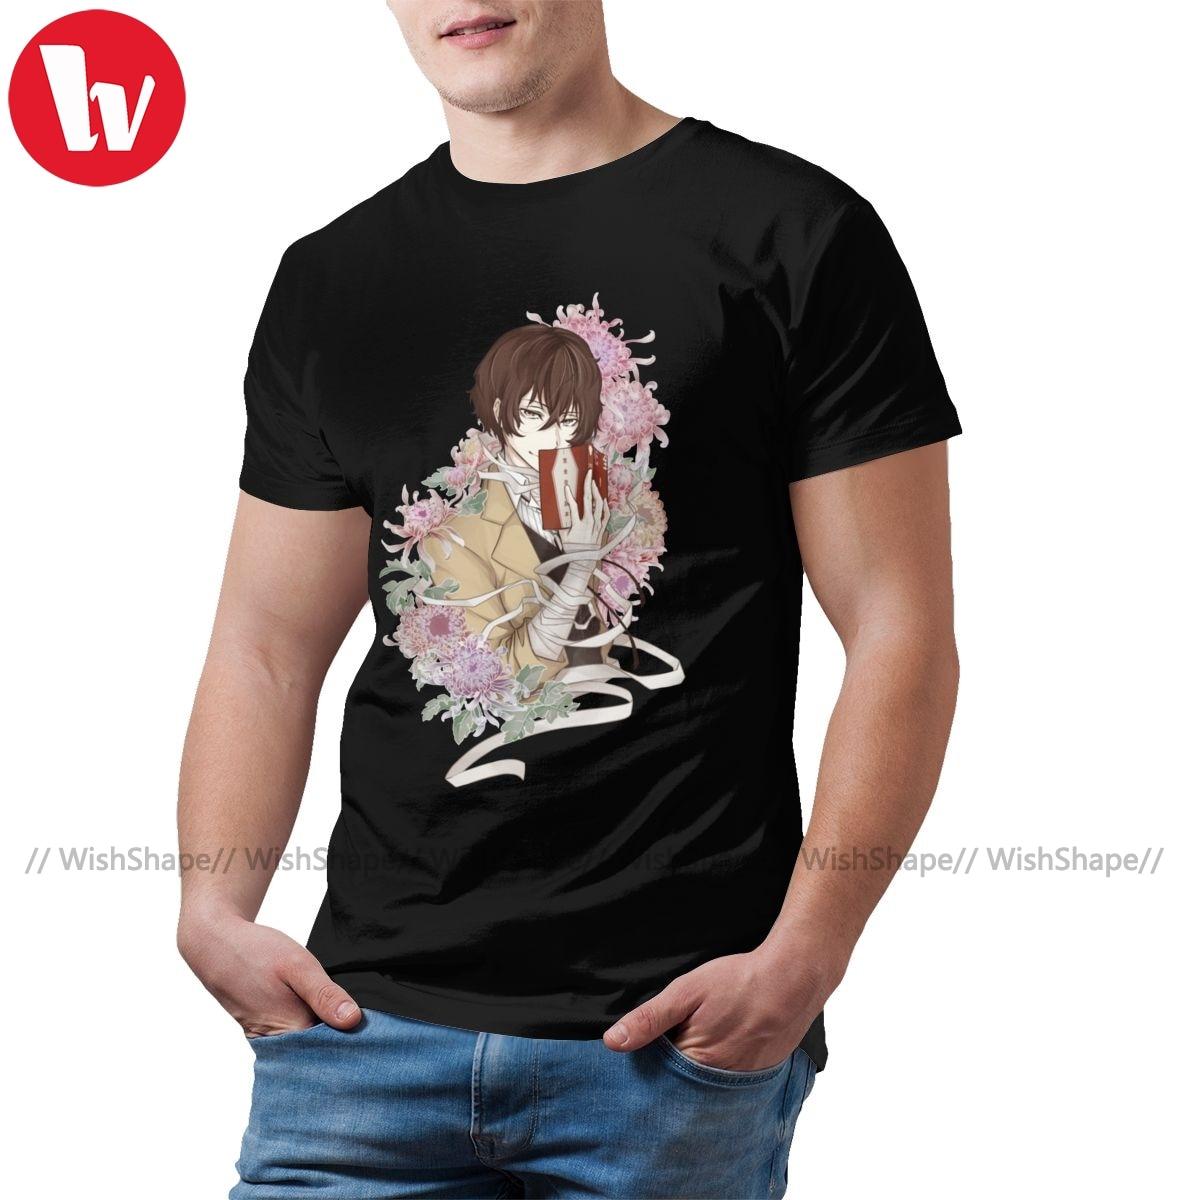 Camiseta con perros callejeros Bungou, camiseta Dazai, camiseta de manga corta para hombre, Camiseta con estampado informal de algodón 5x